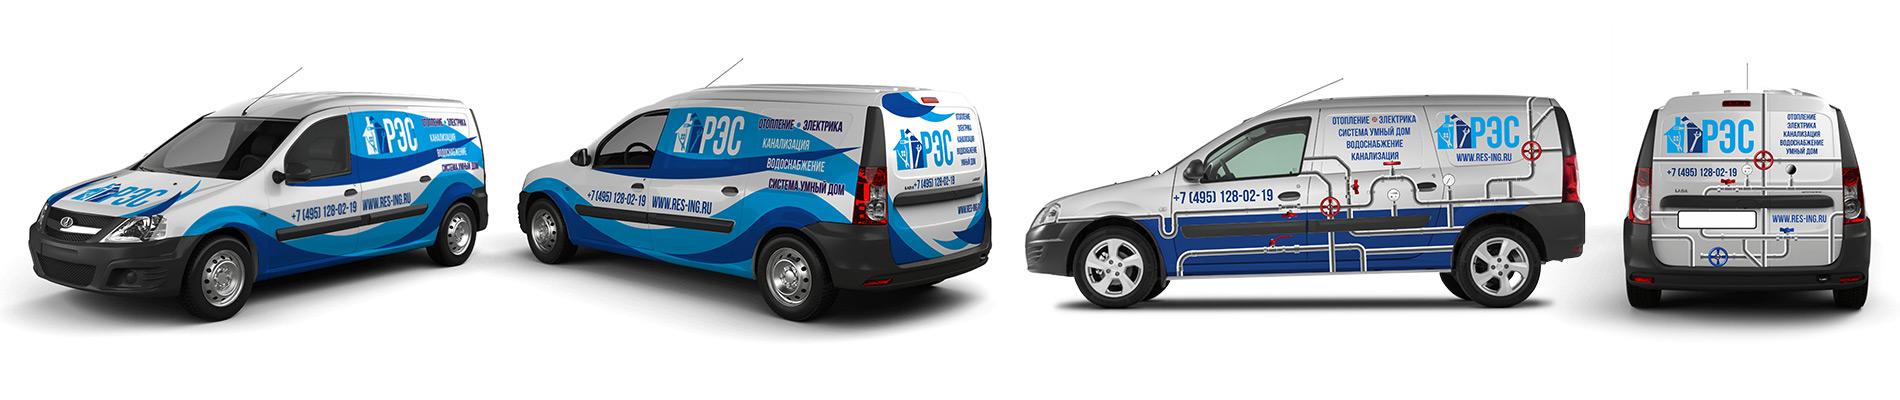 3D визуализация брендирования авто Лада Ларгус